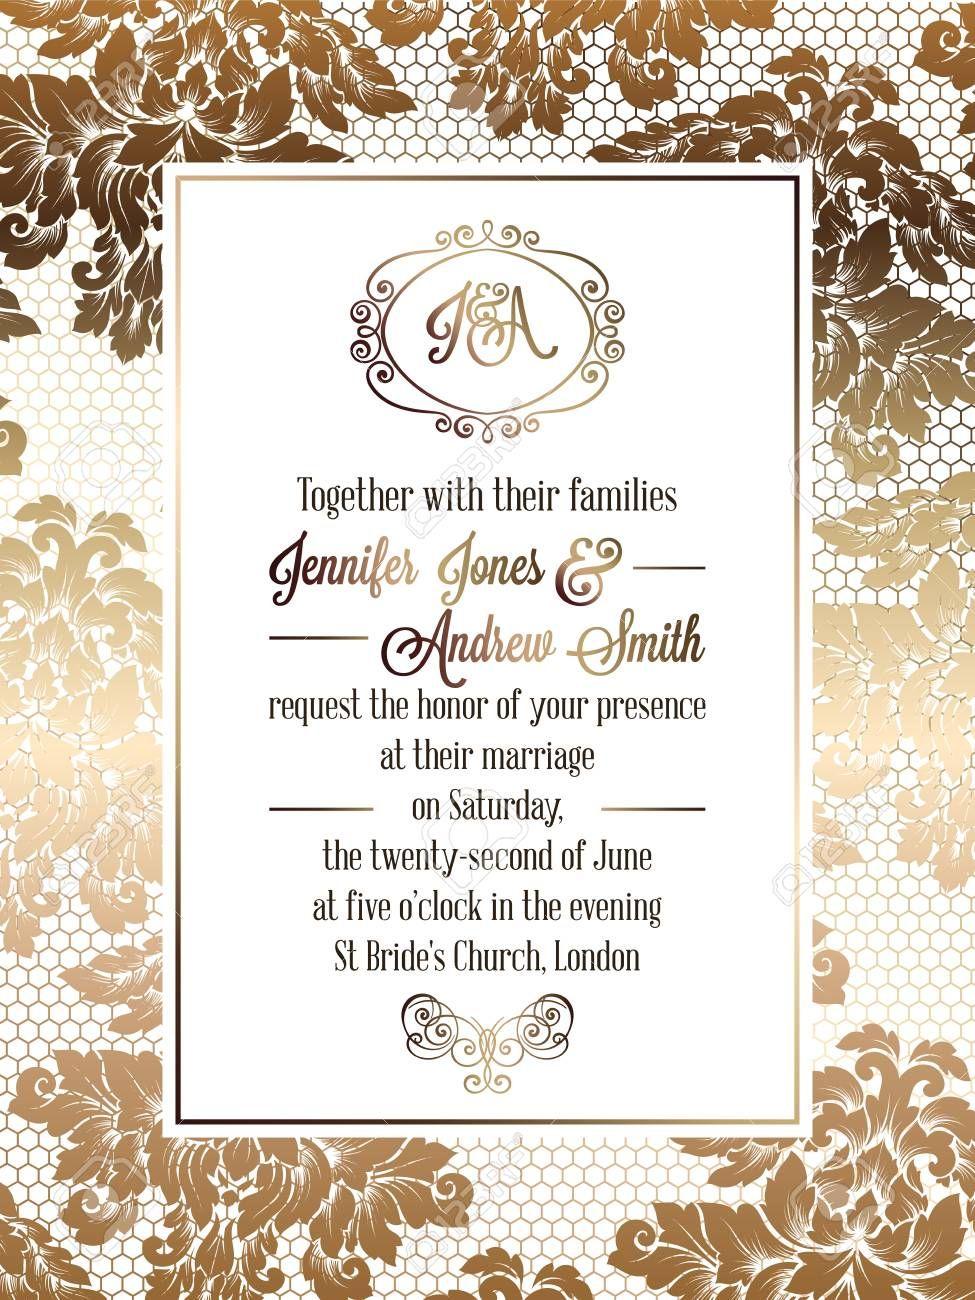 Vintage Baroque Style Wedding Invitation Card Template Elegant Pertaining To Ch Wedding Invitation Templates Wedding Invitation Design Marriage Invitations